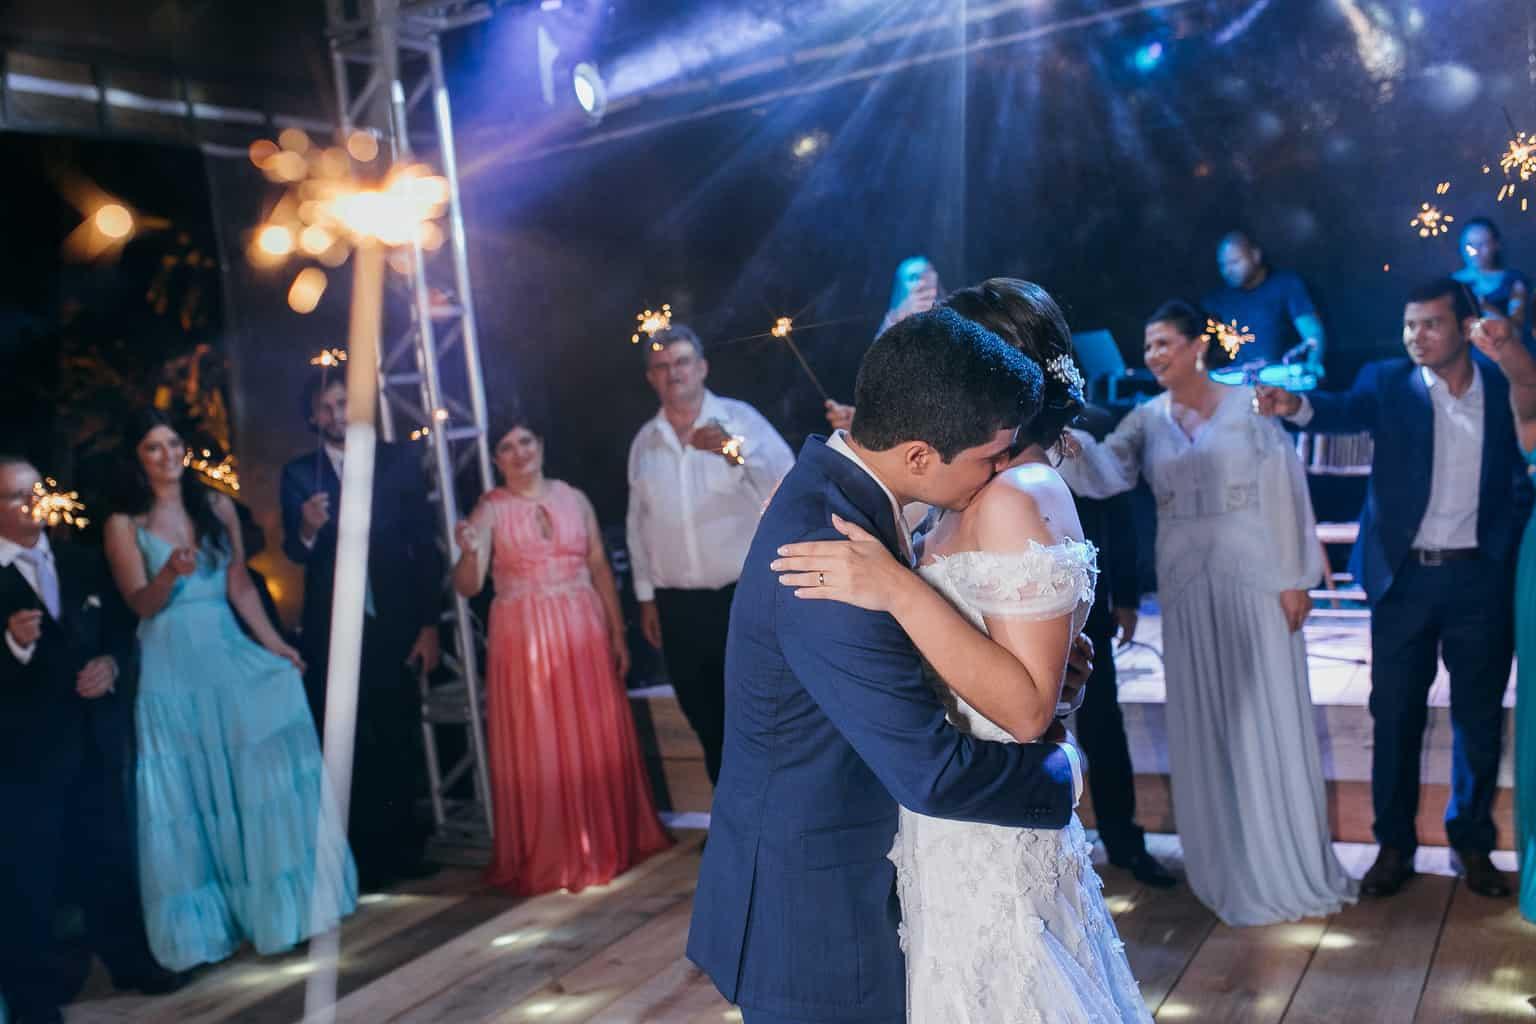 Casamento-Gardenia-e-Marcos-Antonio-Paulo-Bezerra-Joao-Curvelo-Carol-Maiorano1574